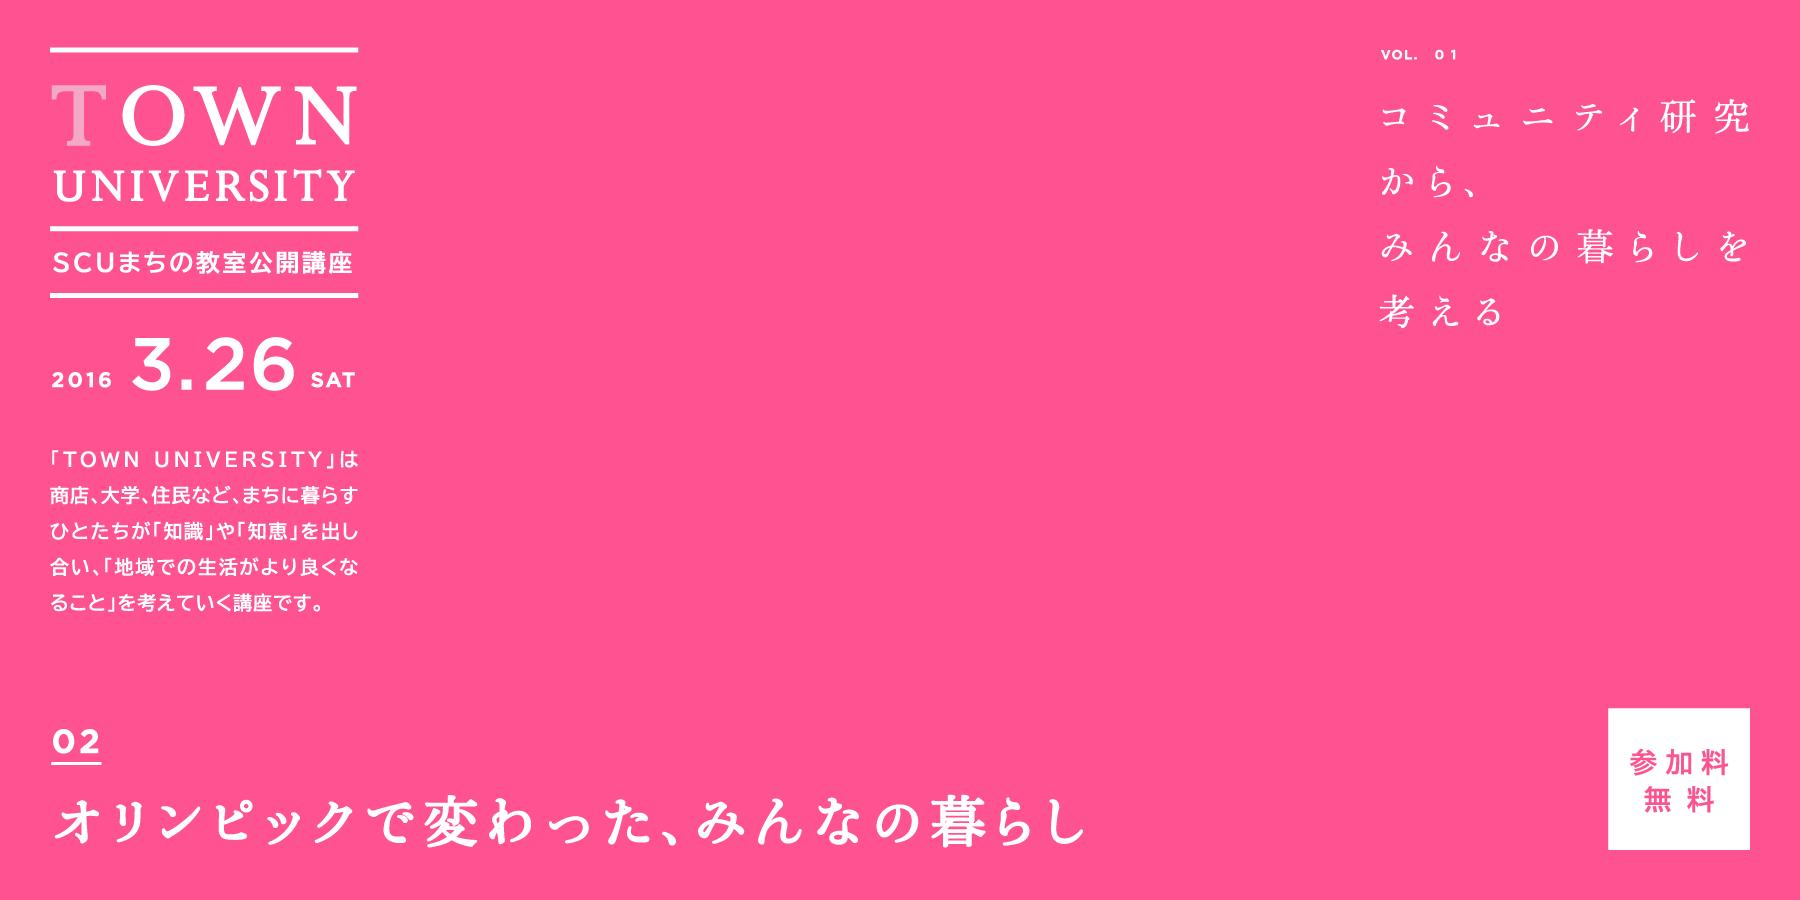 2016-02-03_01_02